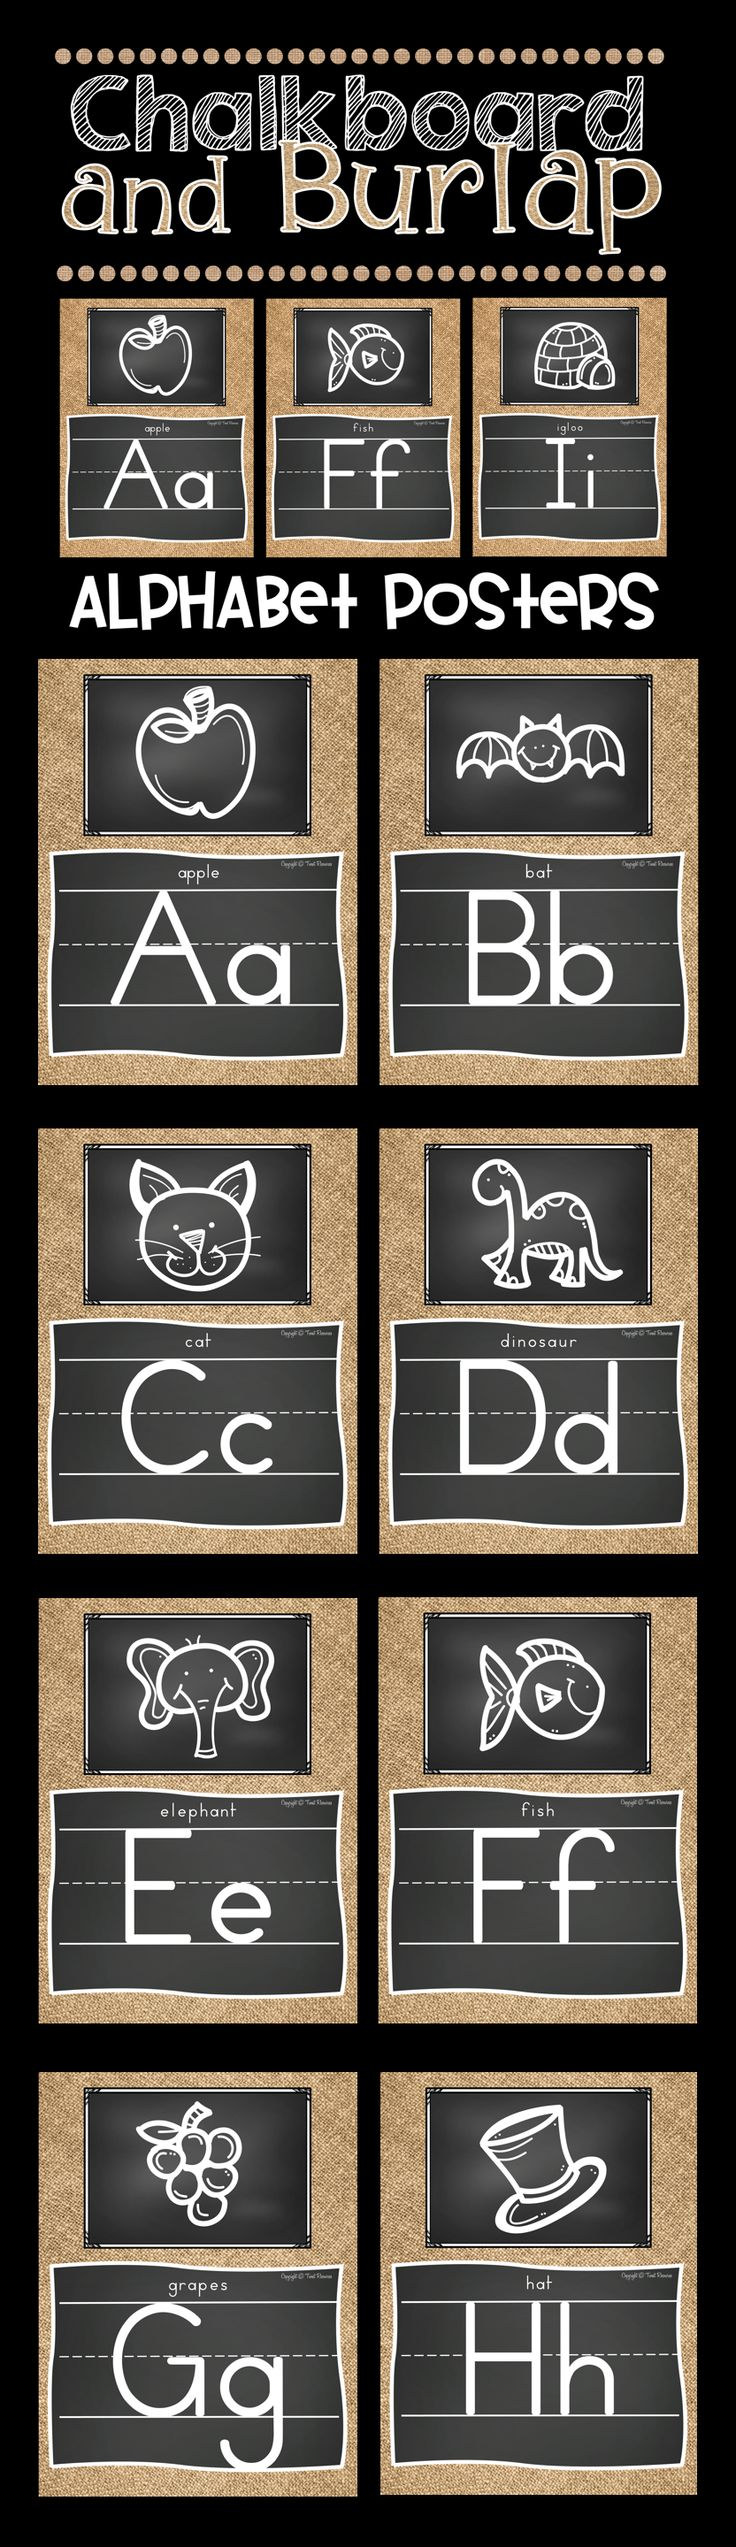 Classroom Chalkboard Decor : Best images about classroom organization on pinterest